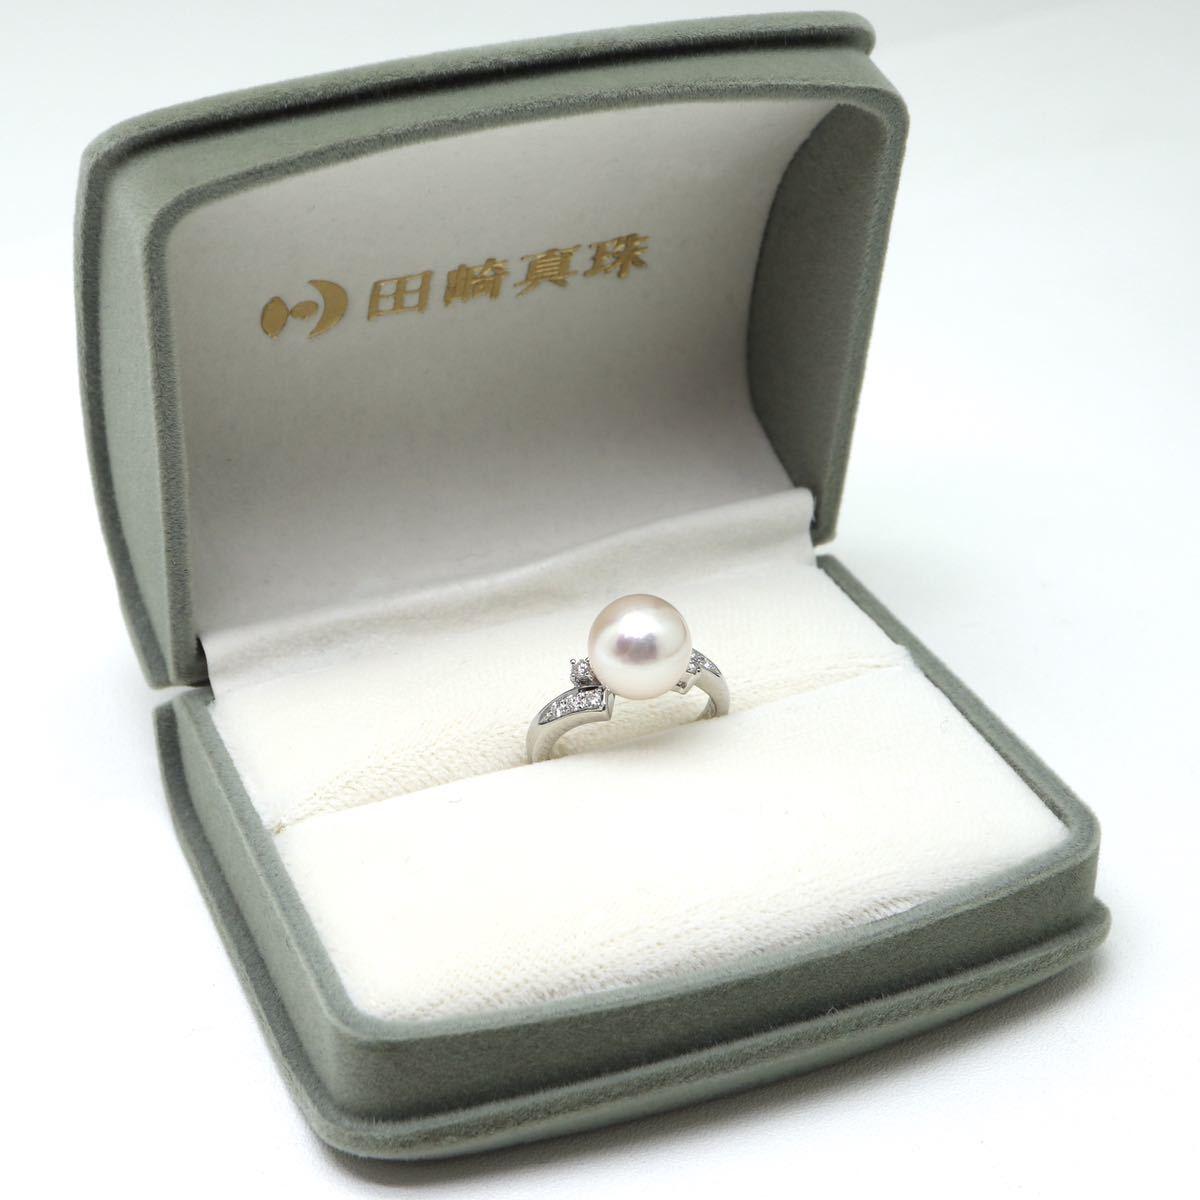 【TASAKI(田崎真珠)】アコヤ本真珠リング 9.0mm珠 0.12ct Pt900 4.9g【サイズ変更無料】【新品仕上げ済】【保証書 専用ケース 箱付き】EB0